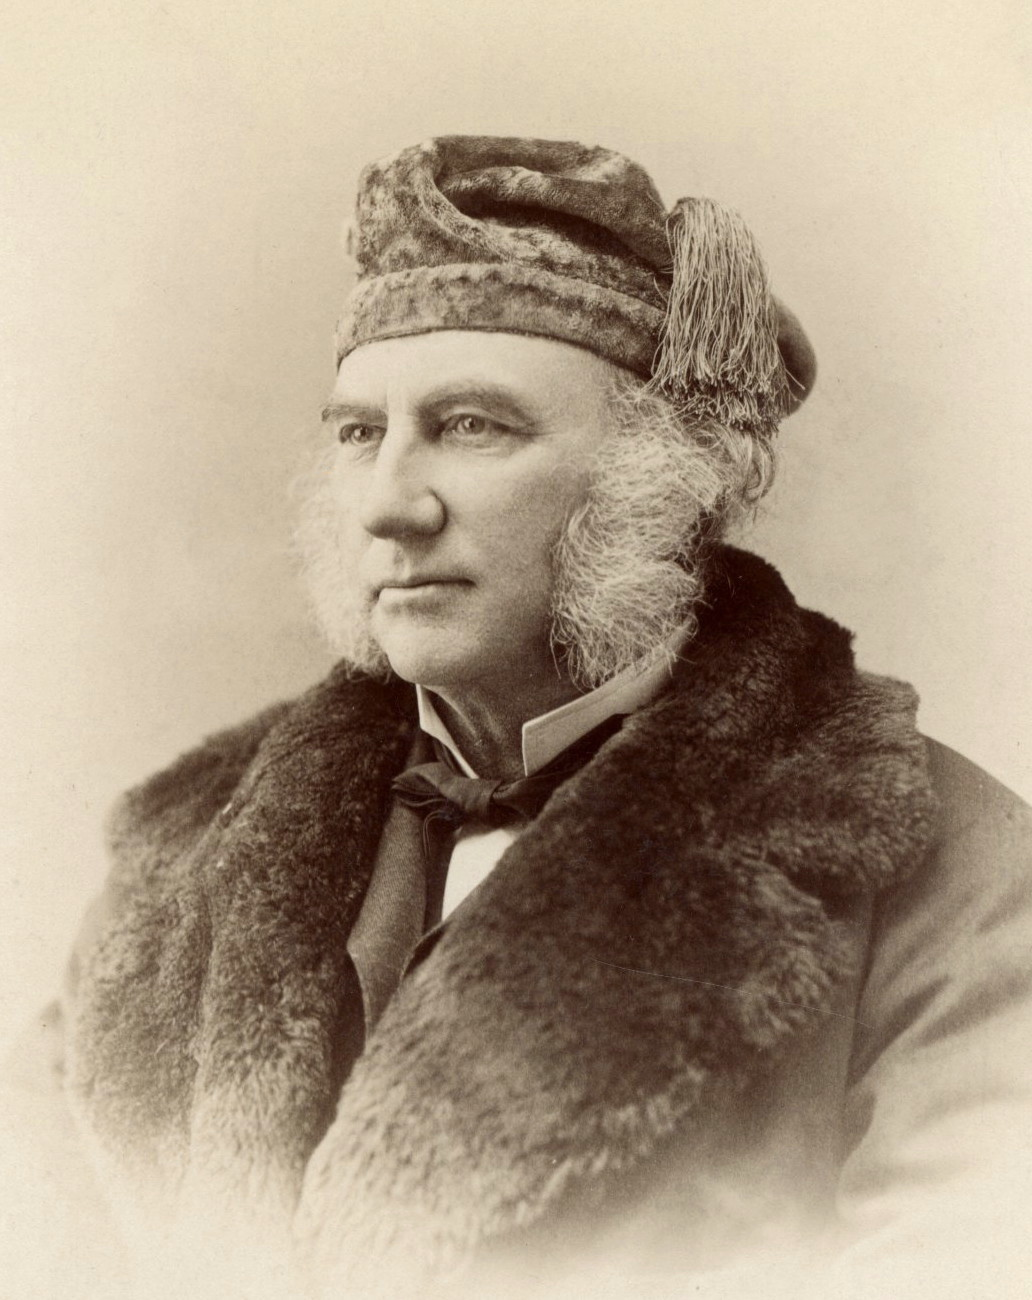 Image of Eben Norton Horsford from Wikidata